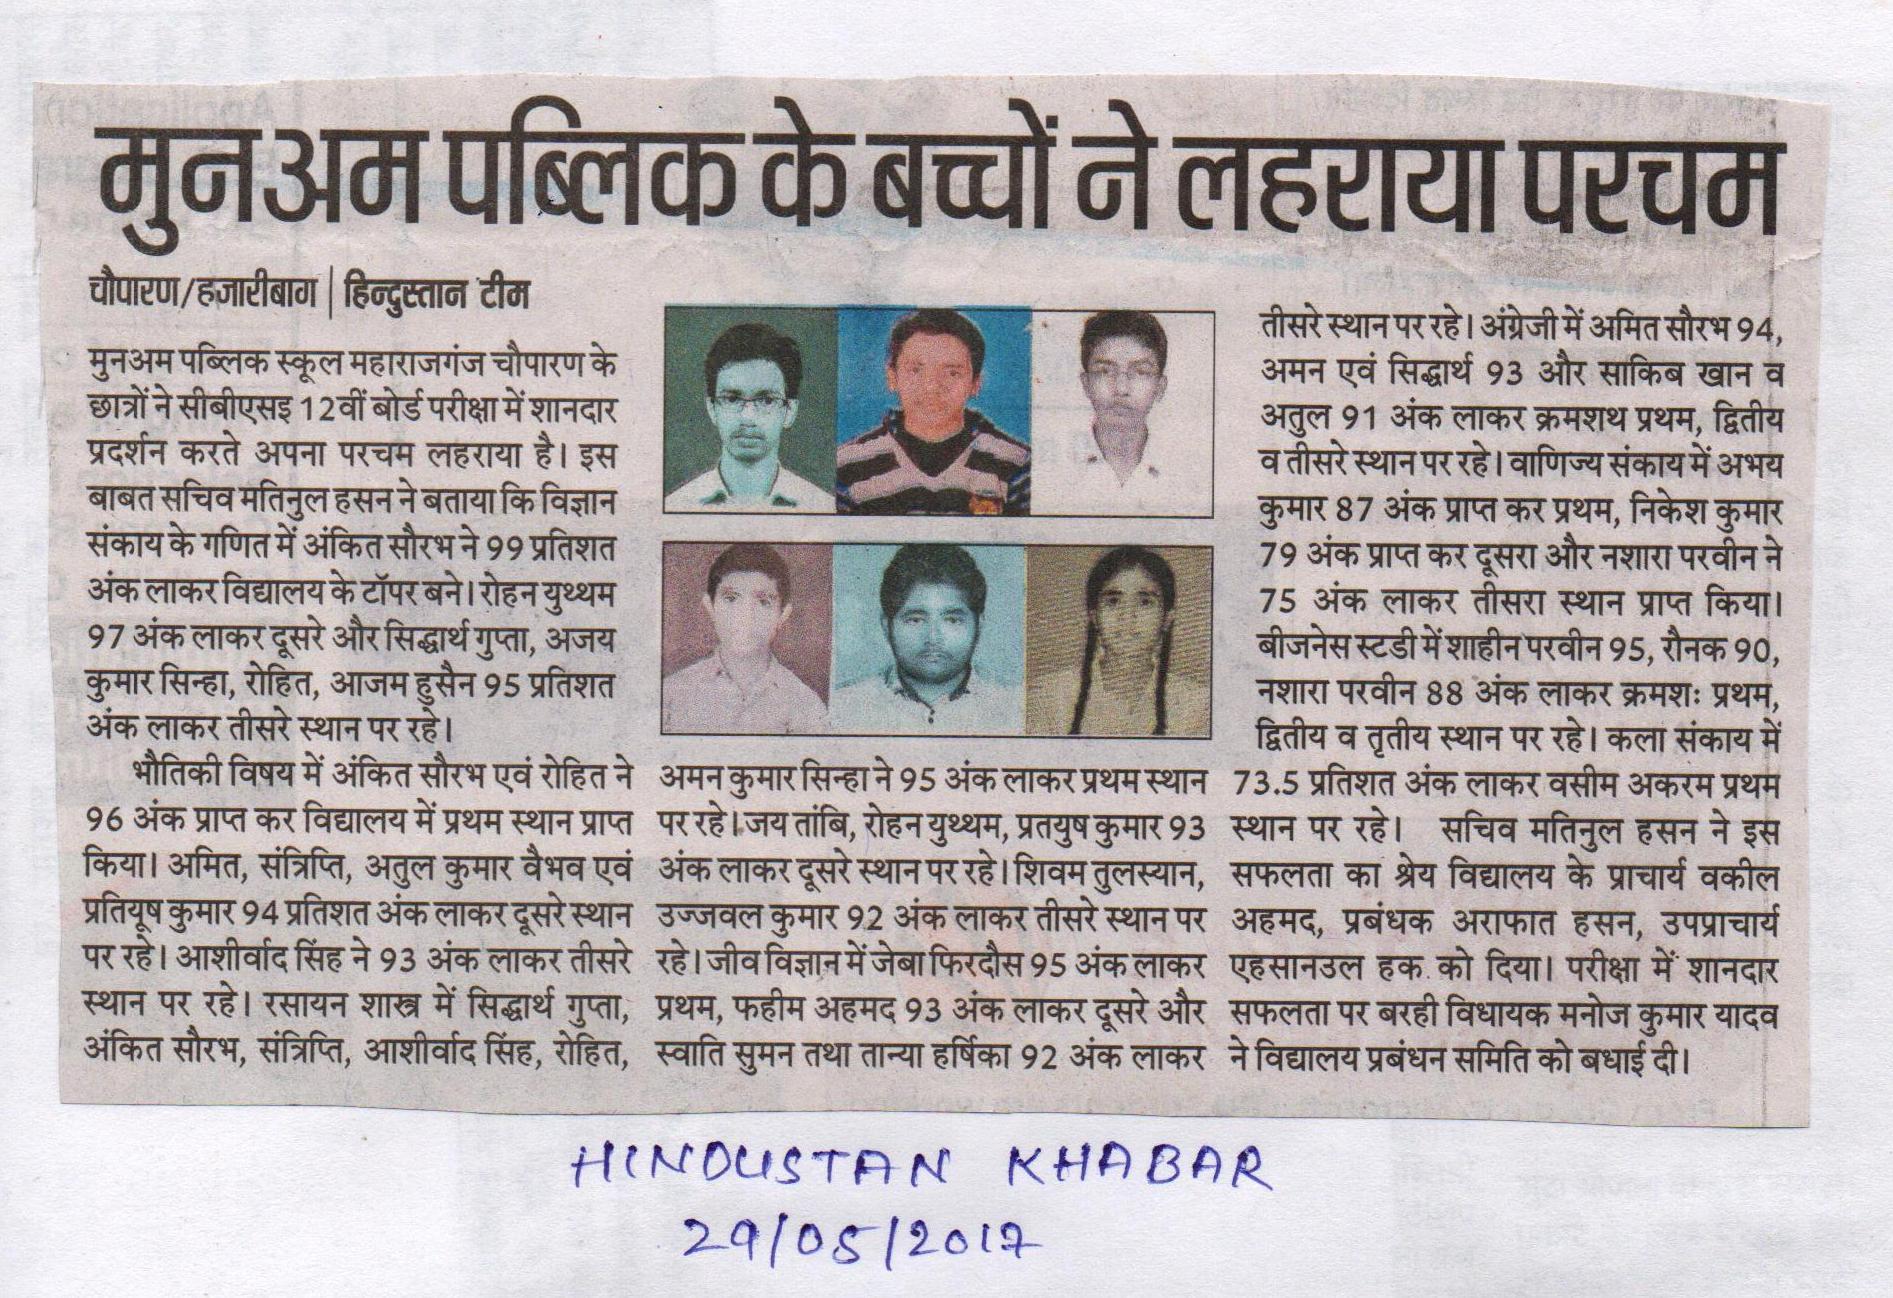 Hindustan | Munam Public School | munampublicschool.com